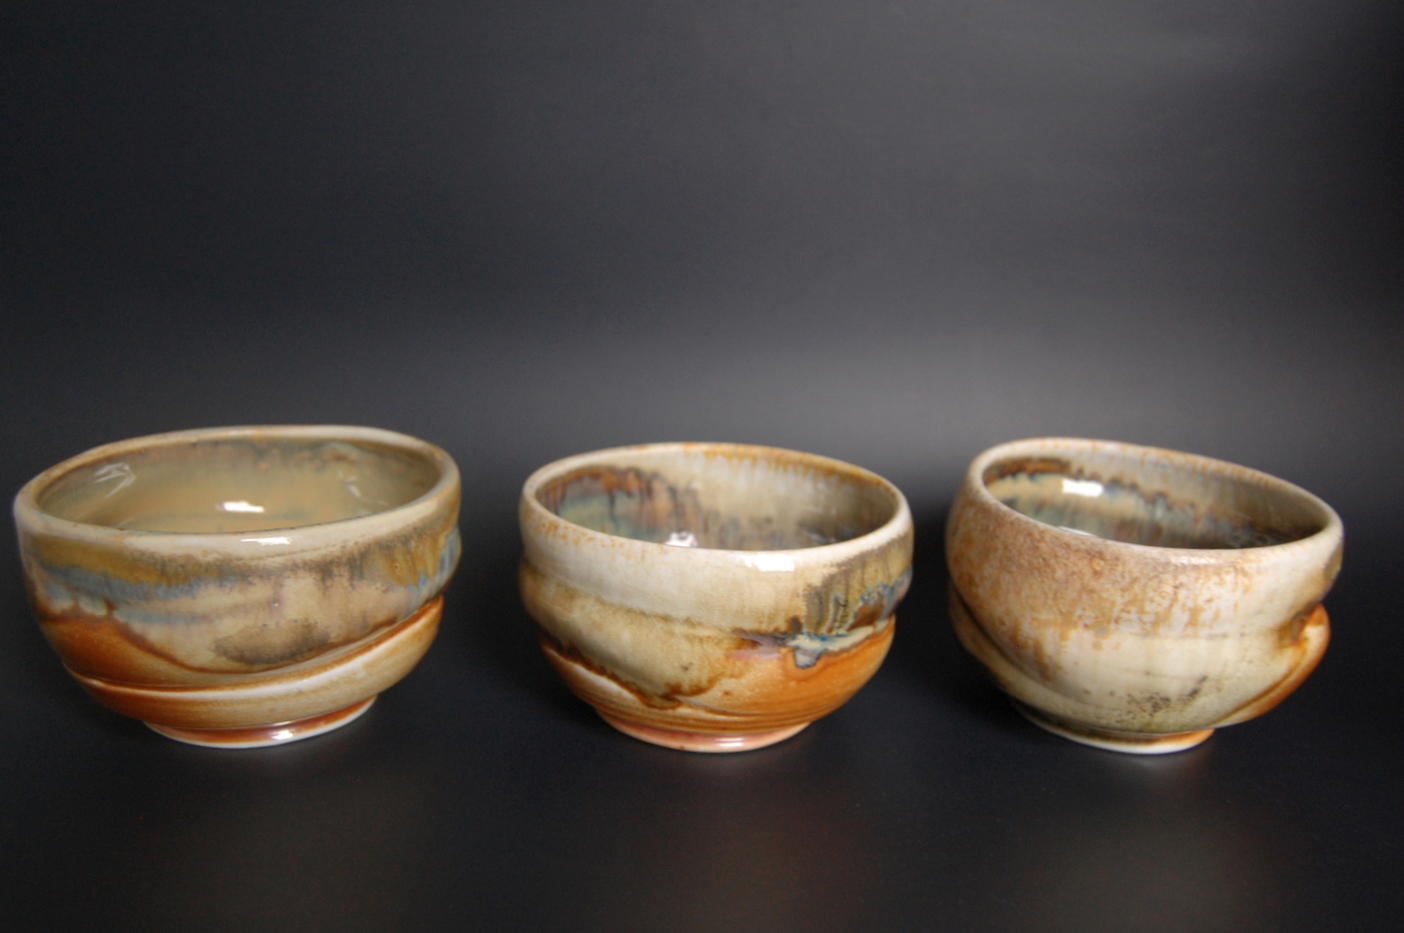 Wood Fired Tea Bowls